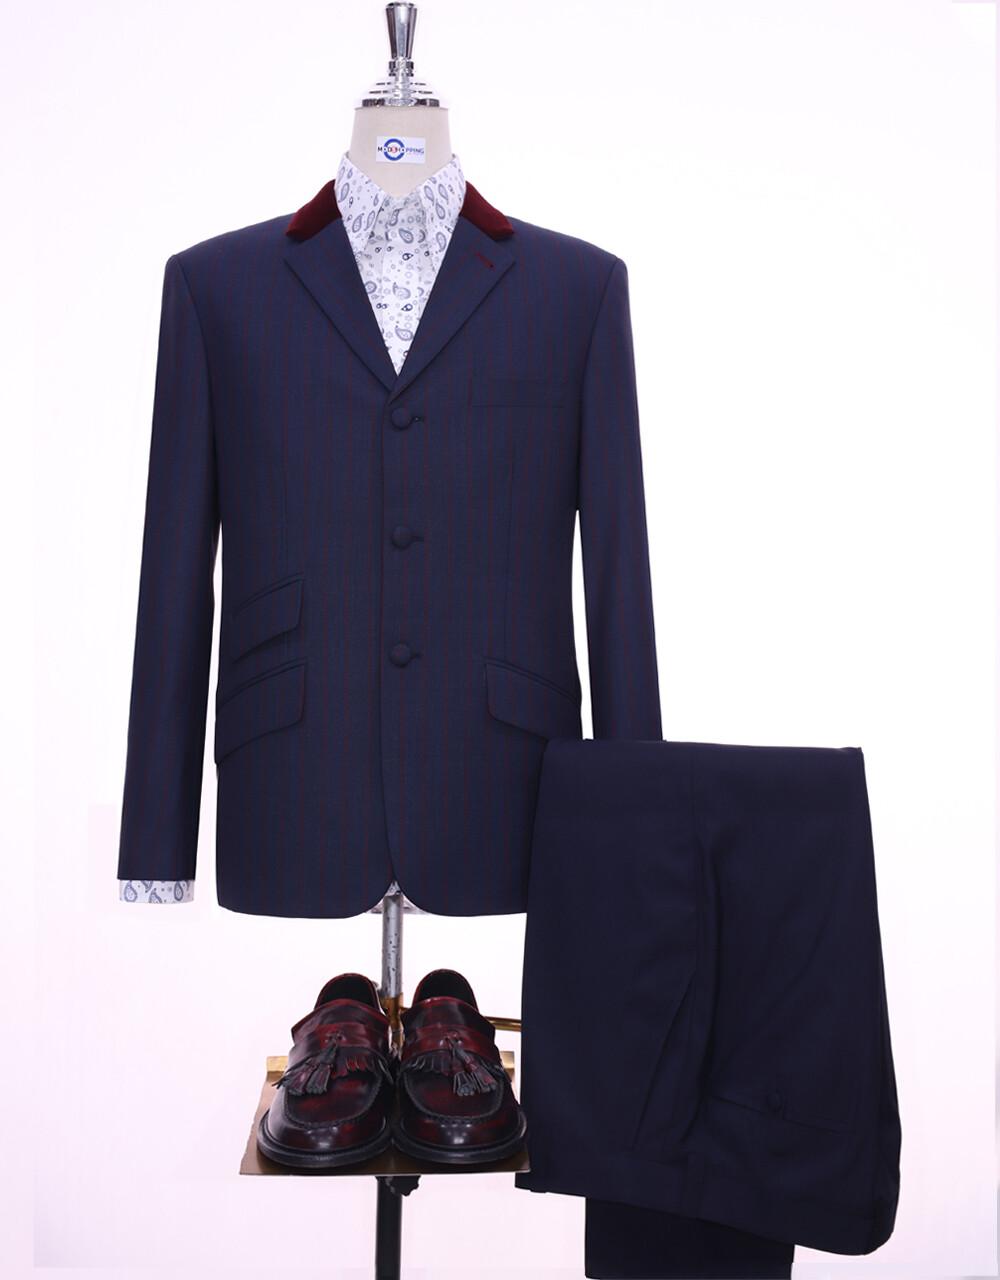 Navy Blue And Burgundy Stripe Jacket   60s Style Jacket